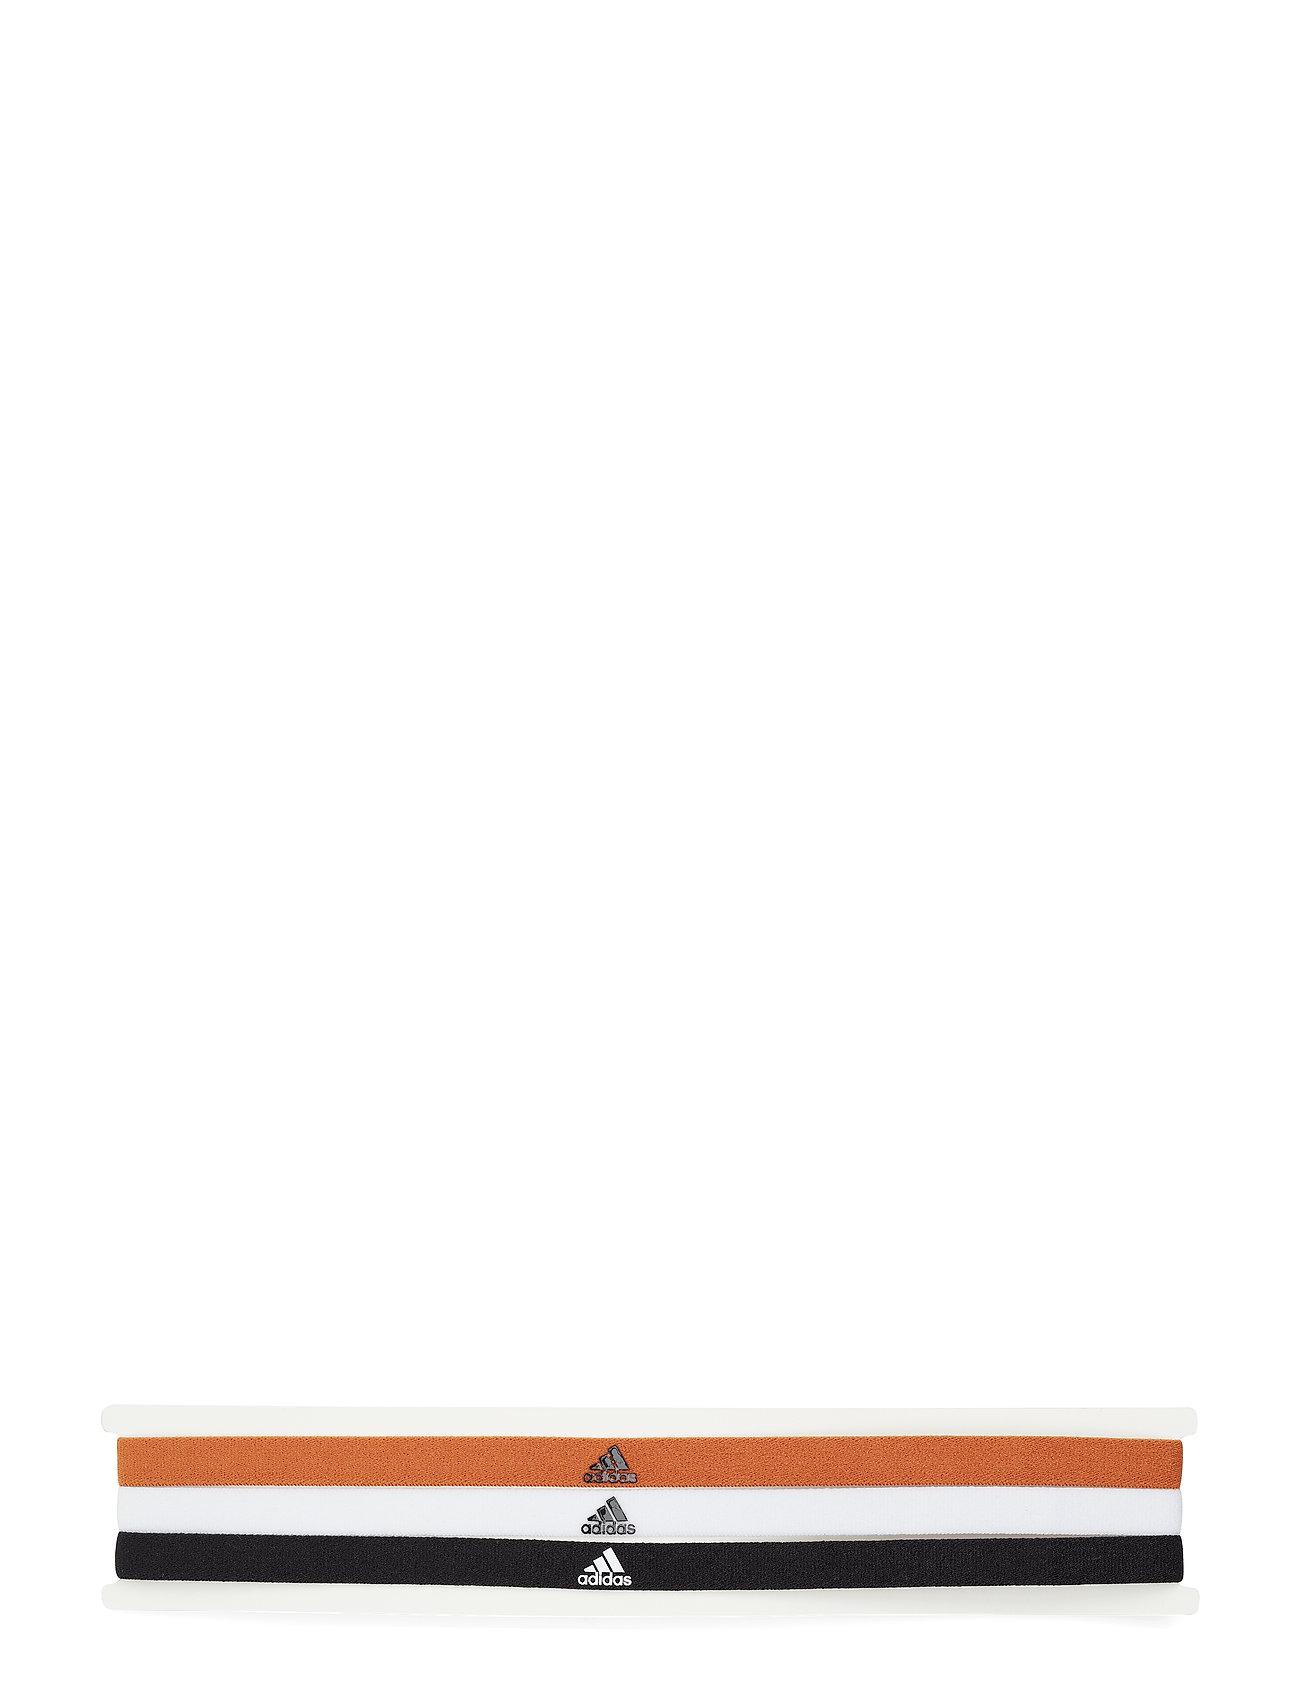 Image of 3pp Hairband Hårtilbehør Multi/mønstret Adidas Performance (3195057129)